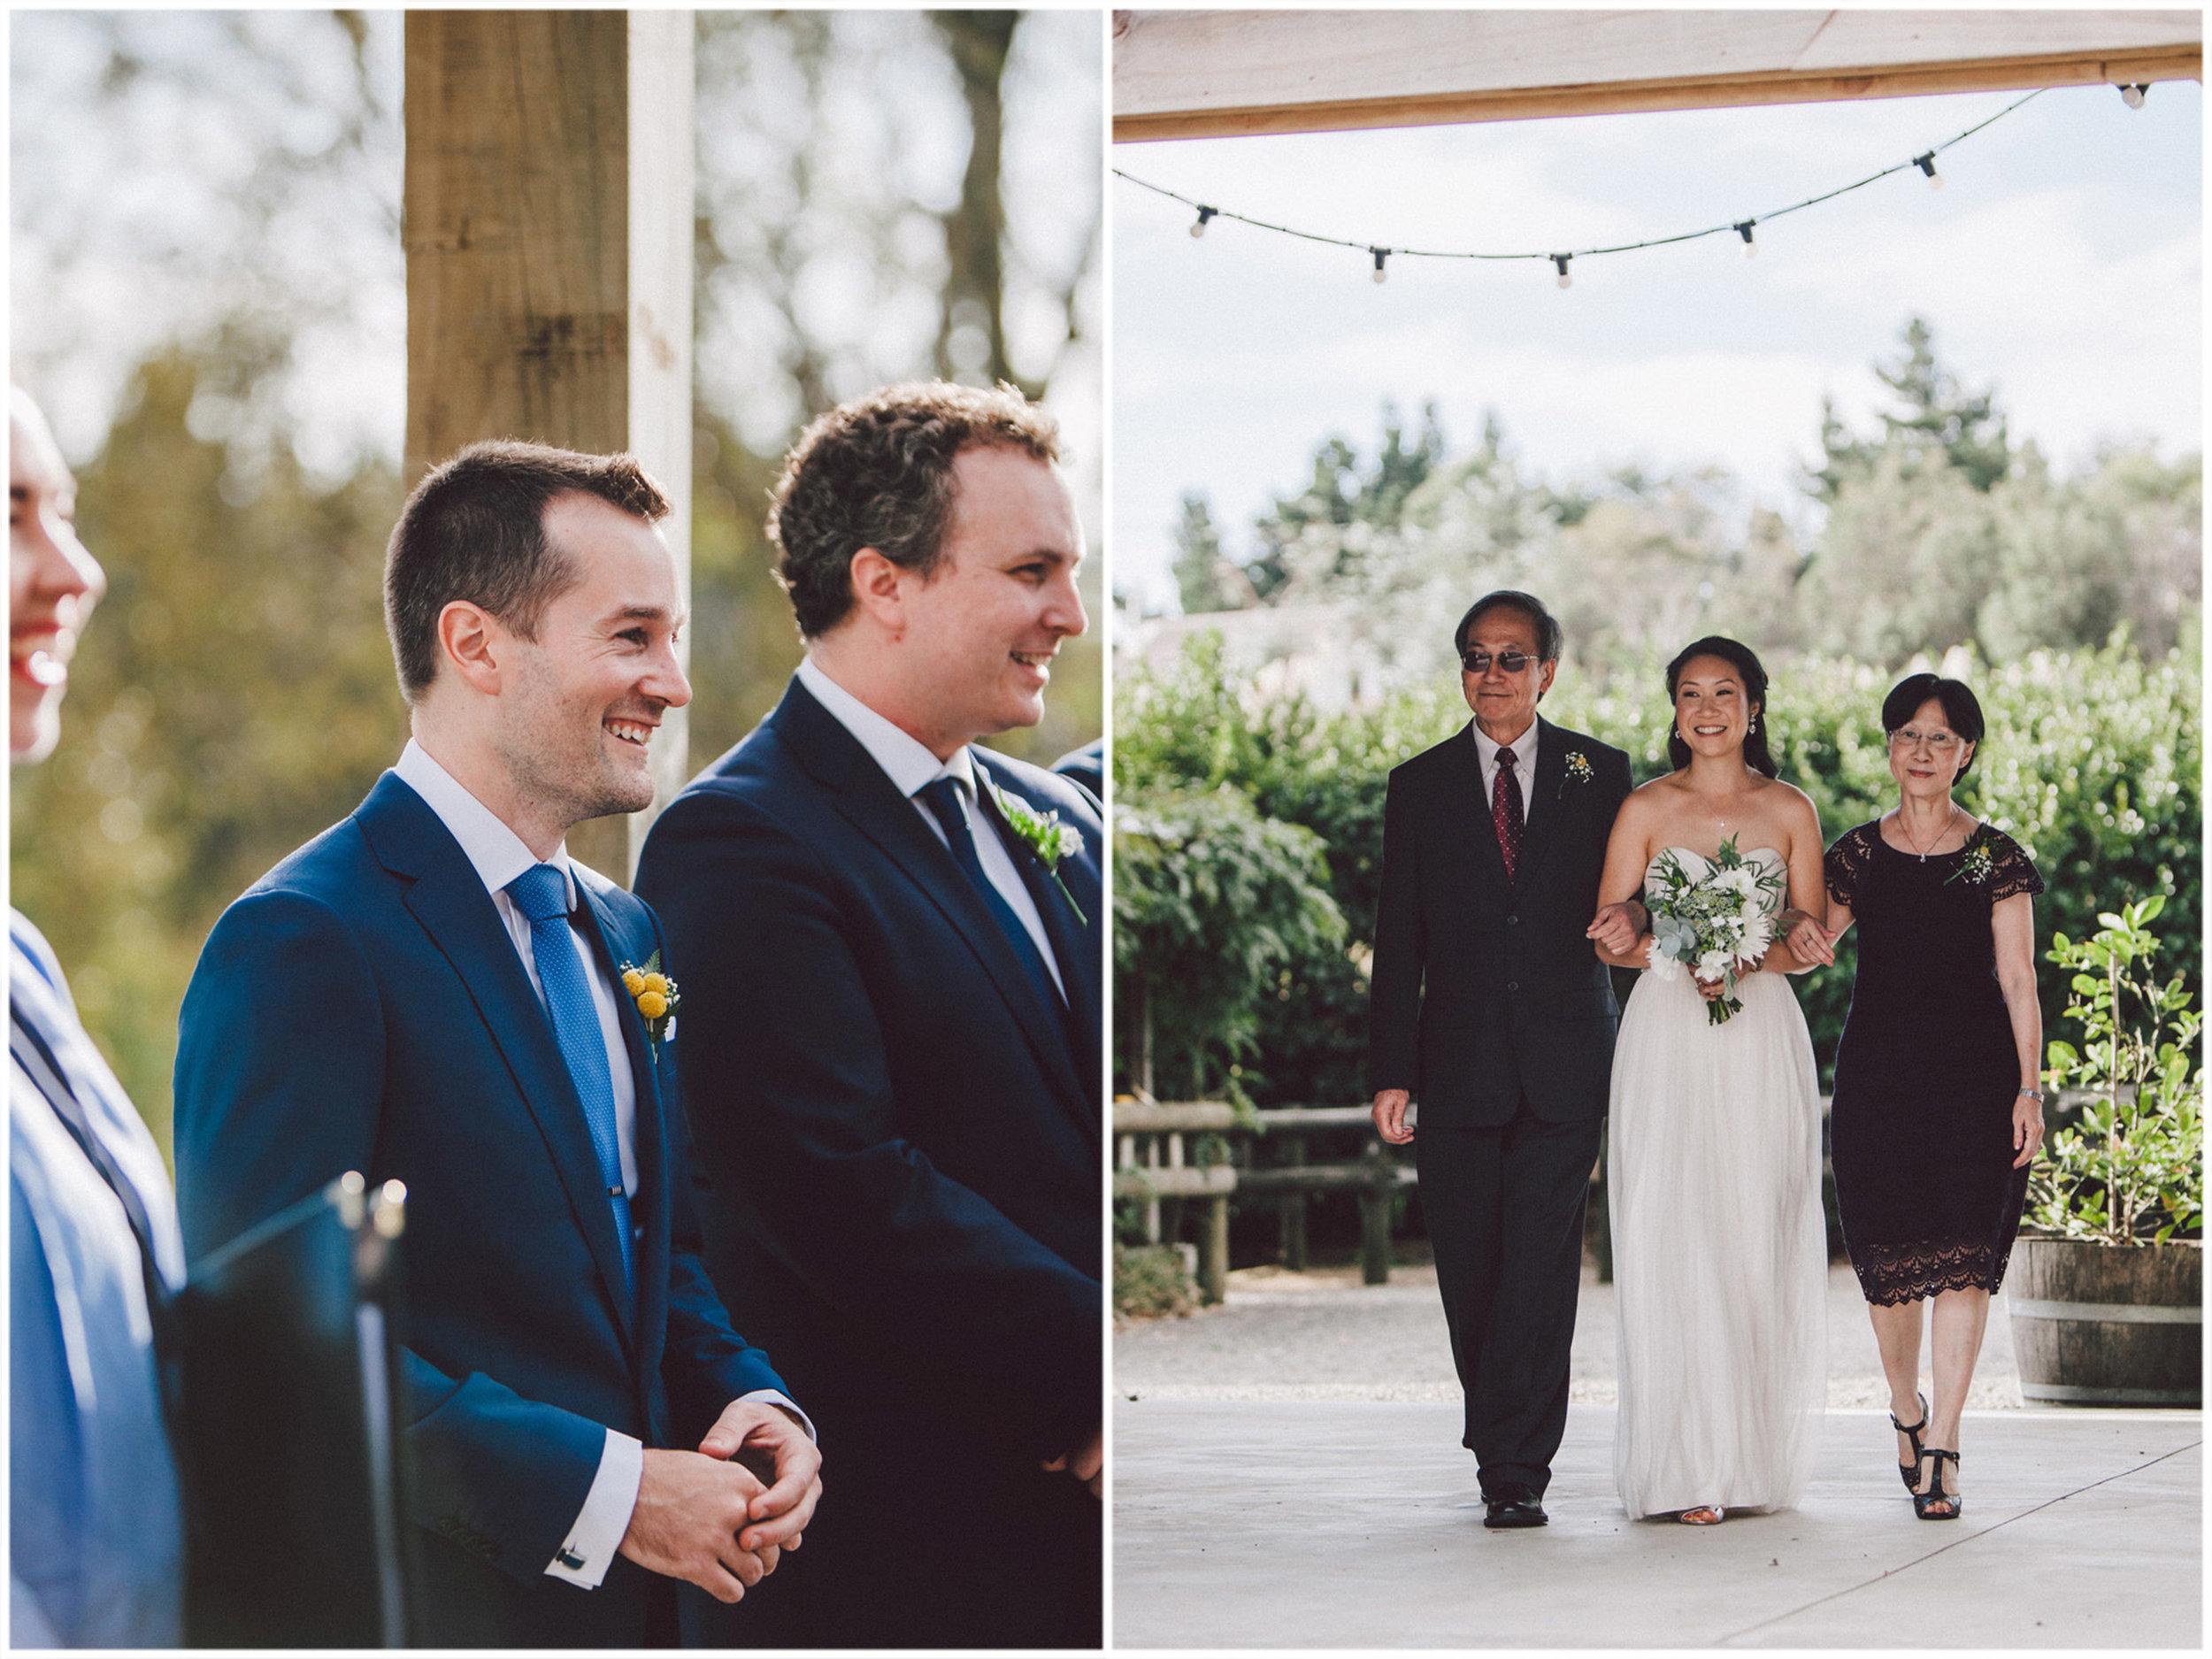 Sarah_McEvoy_Sudbury_Wedding_TK_012.jpg